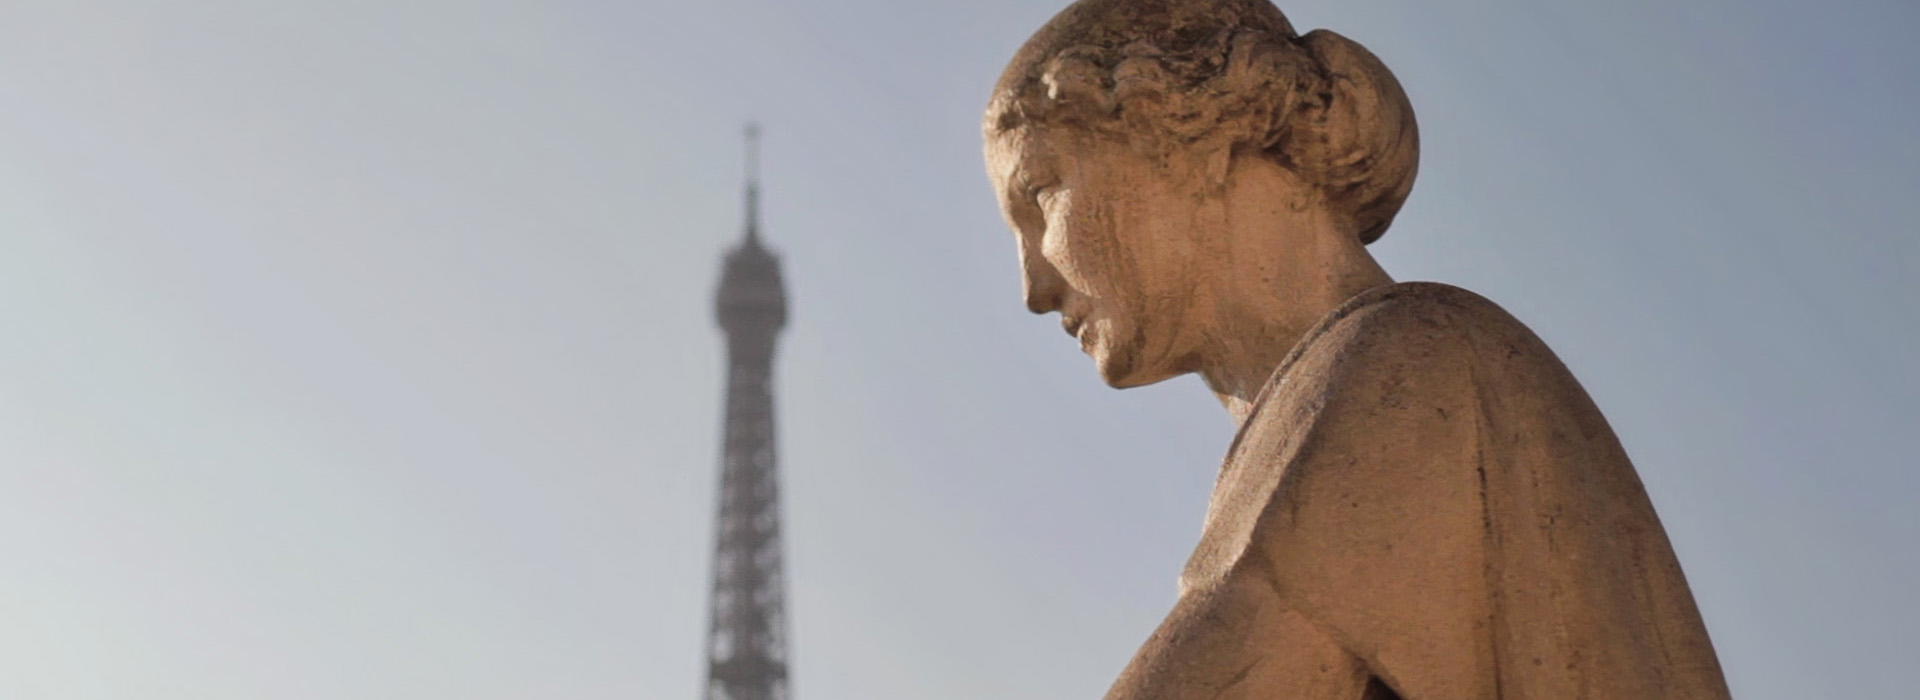 Paris-Thumbnail-Home-Page